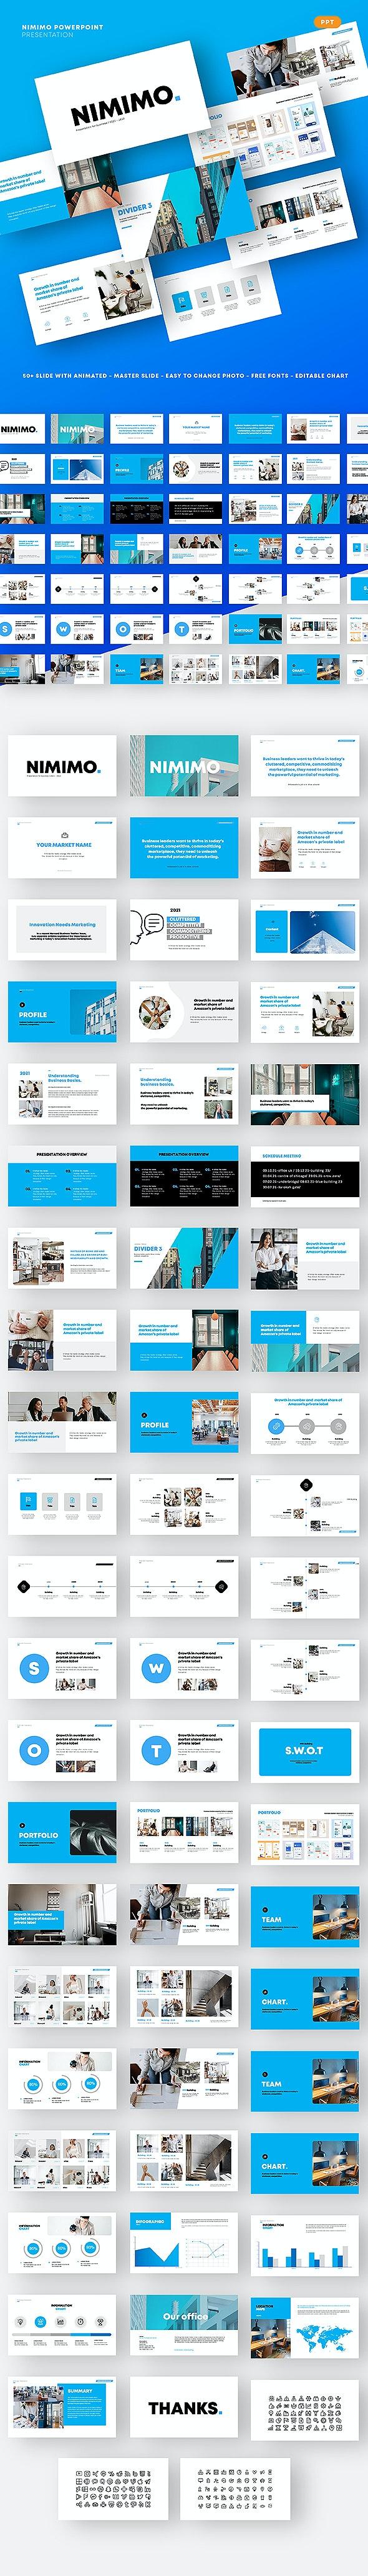 Nimimo Simple Presentation - PowerPoint Templates Presentation Templates